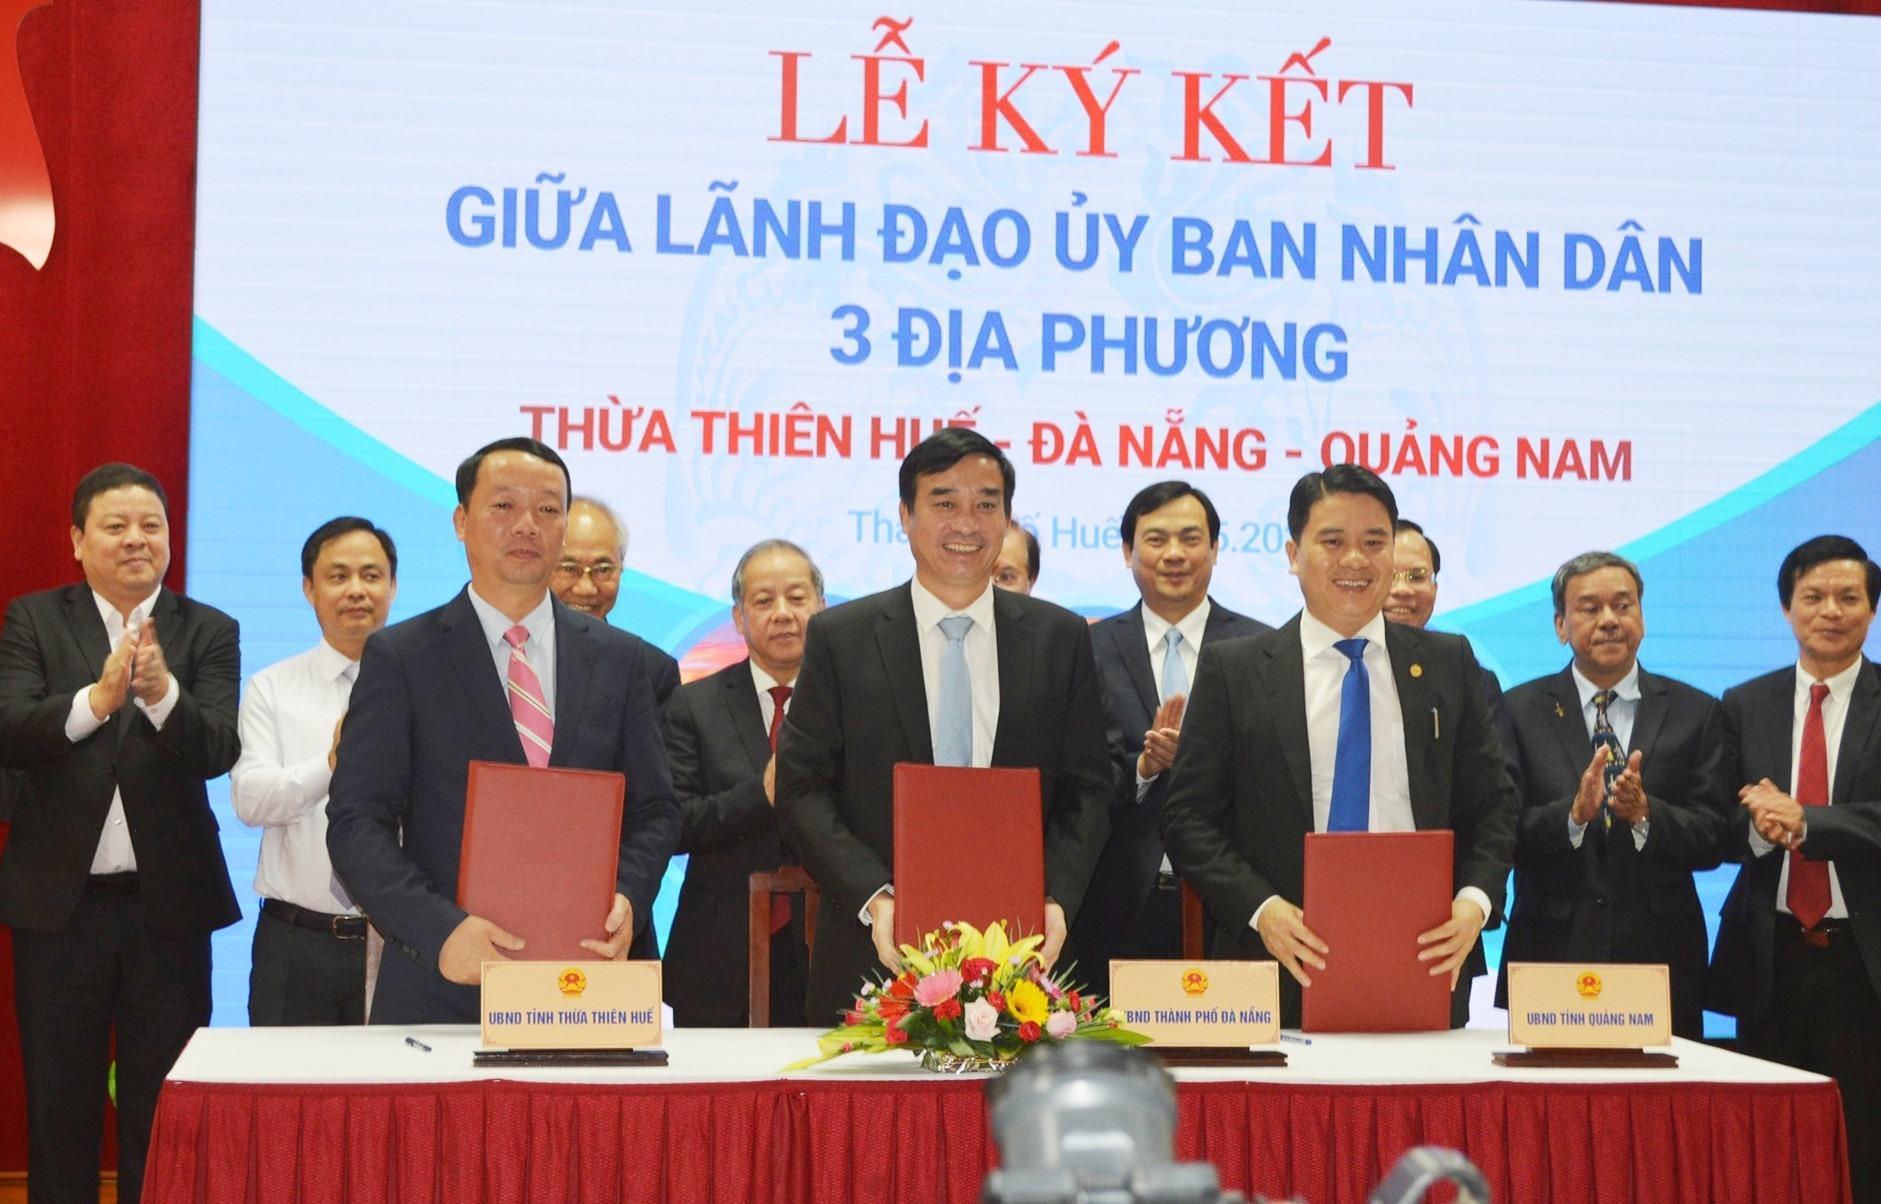 Signing ceremony between leaders of Quang Nam, Da Nang and Thua Thien Hue